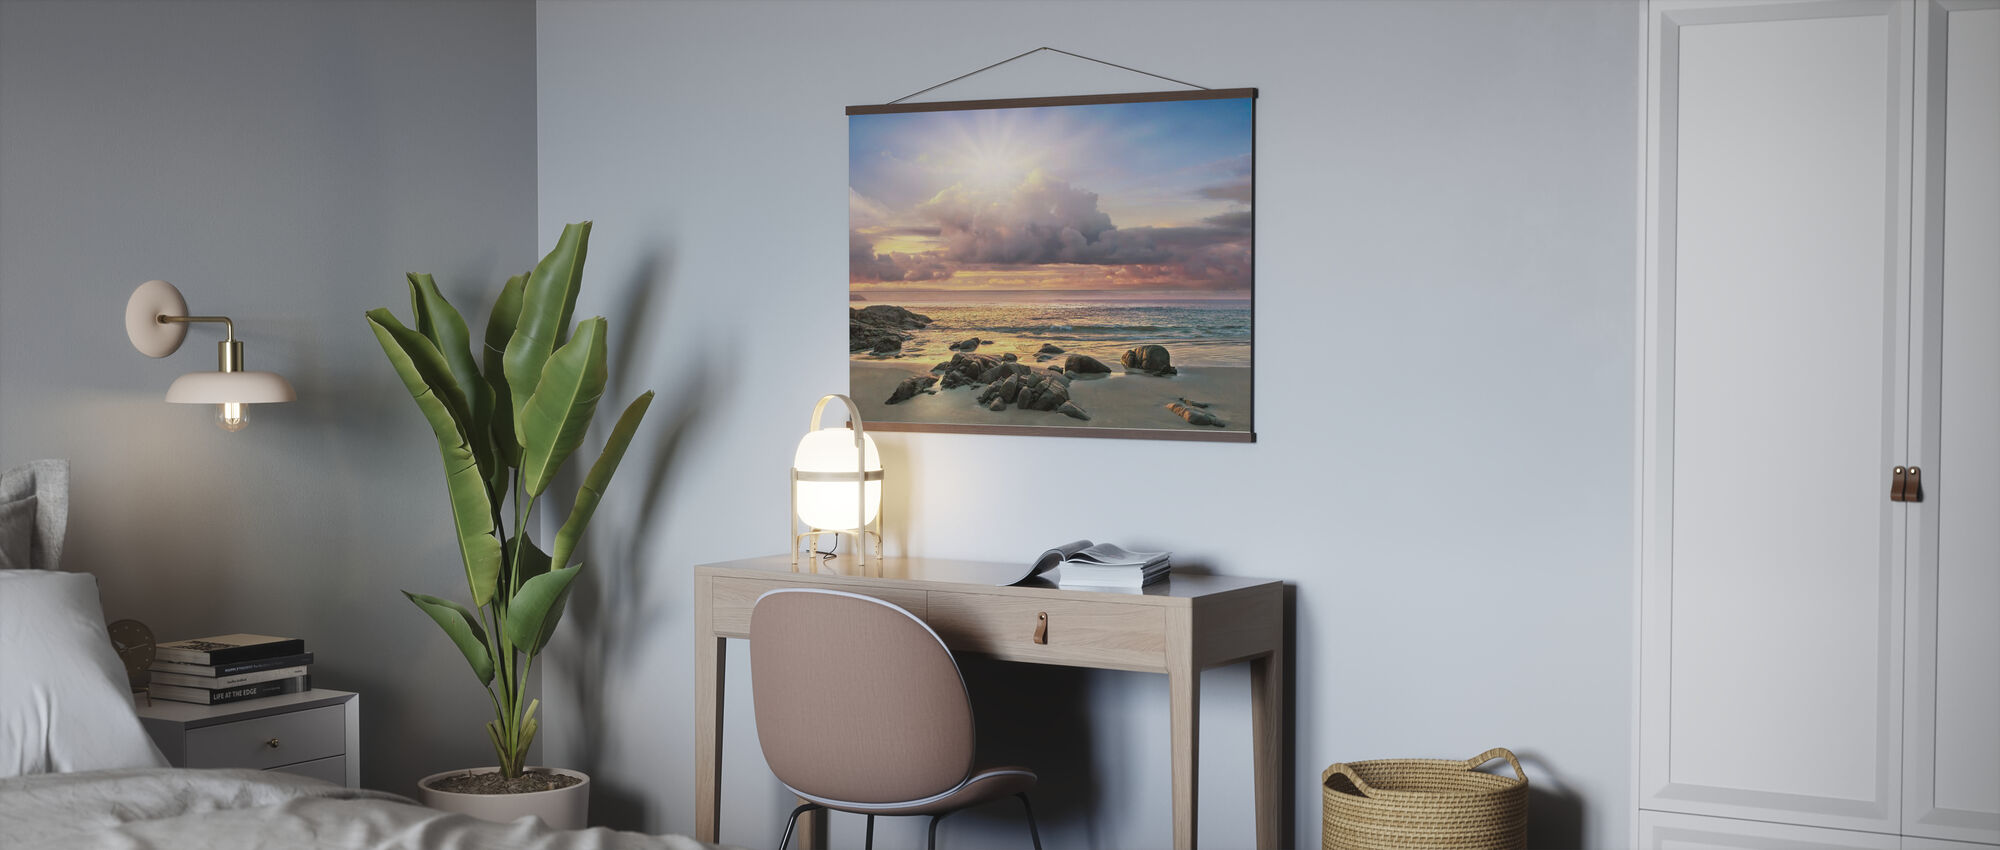 Soluppgång bakom moln - Poster - Kontor